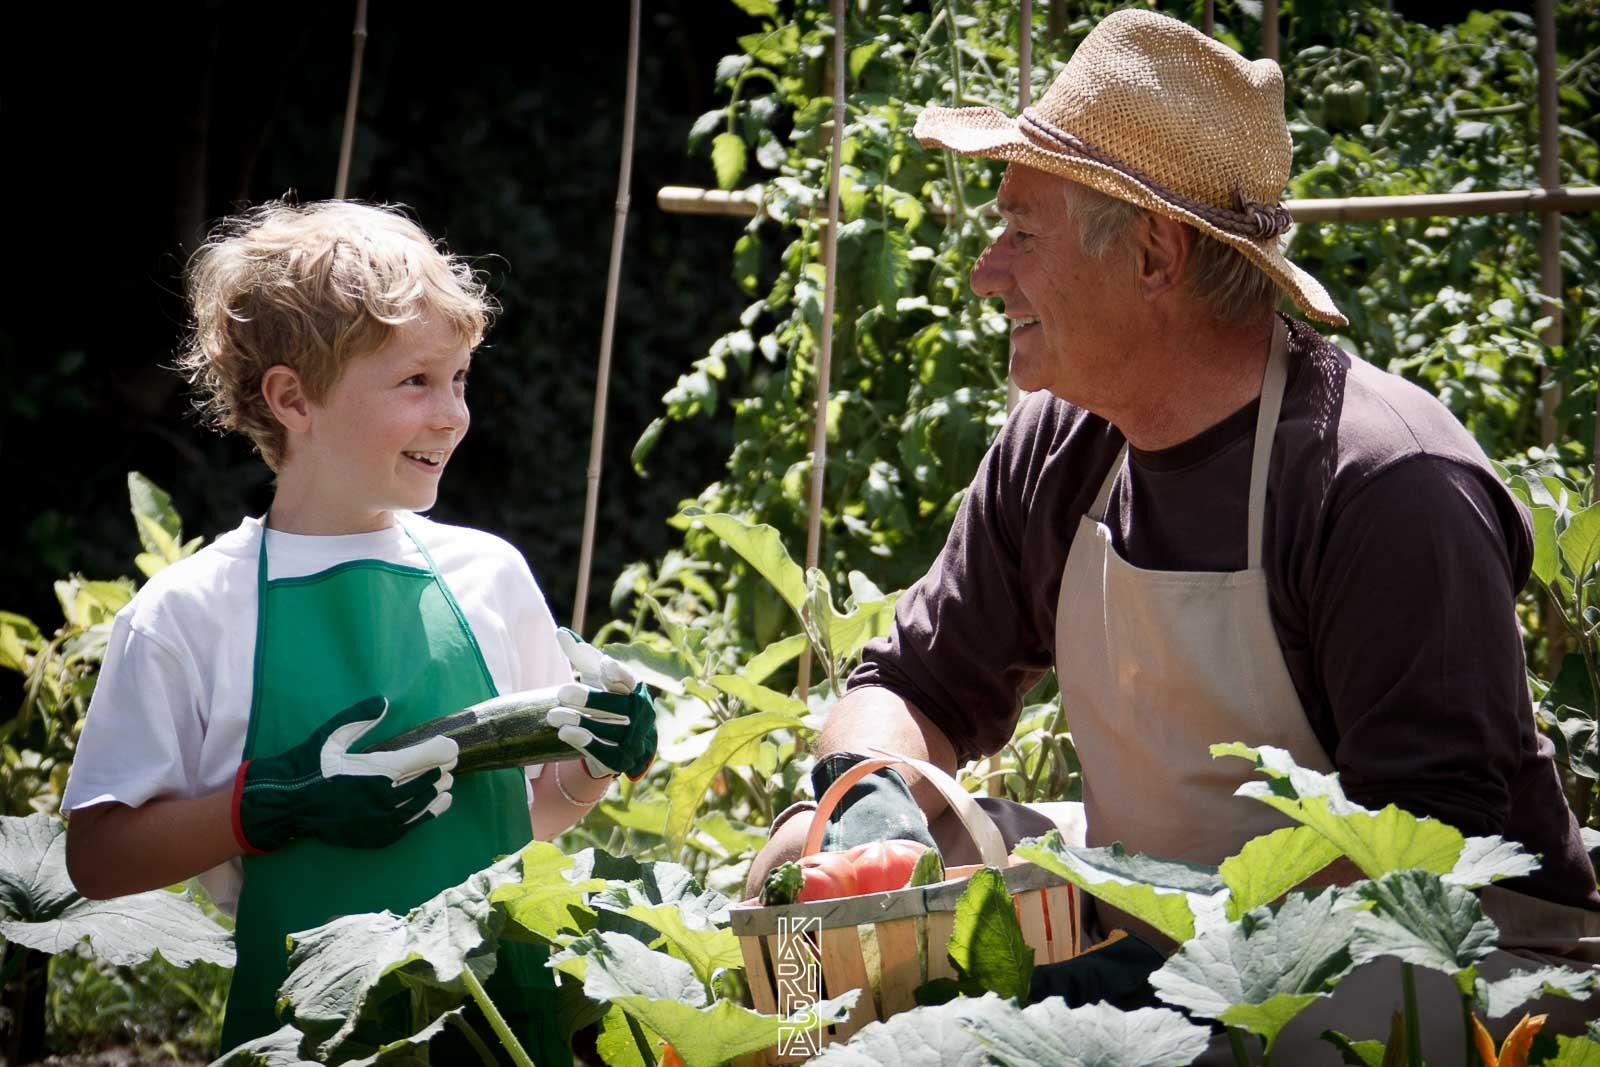 013-planjardin-jardinier&enfants.jpg